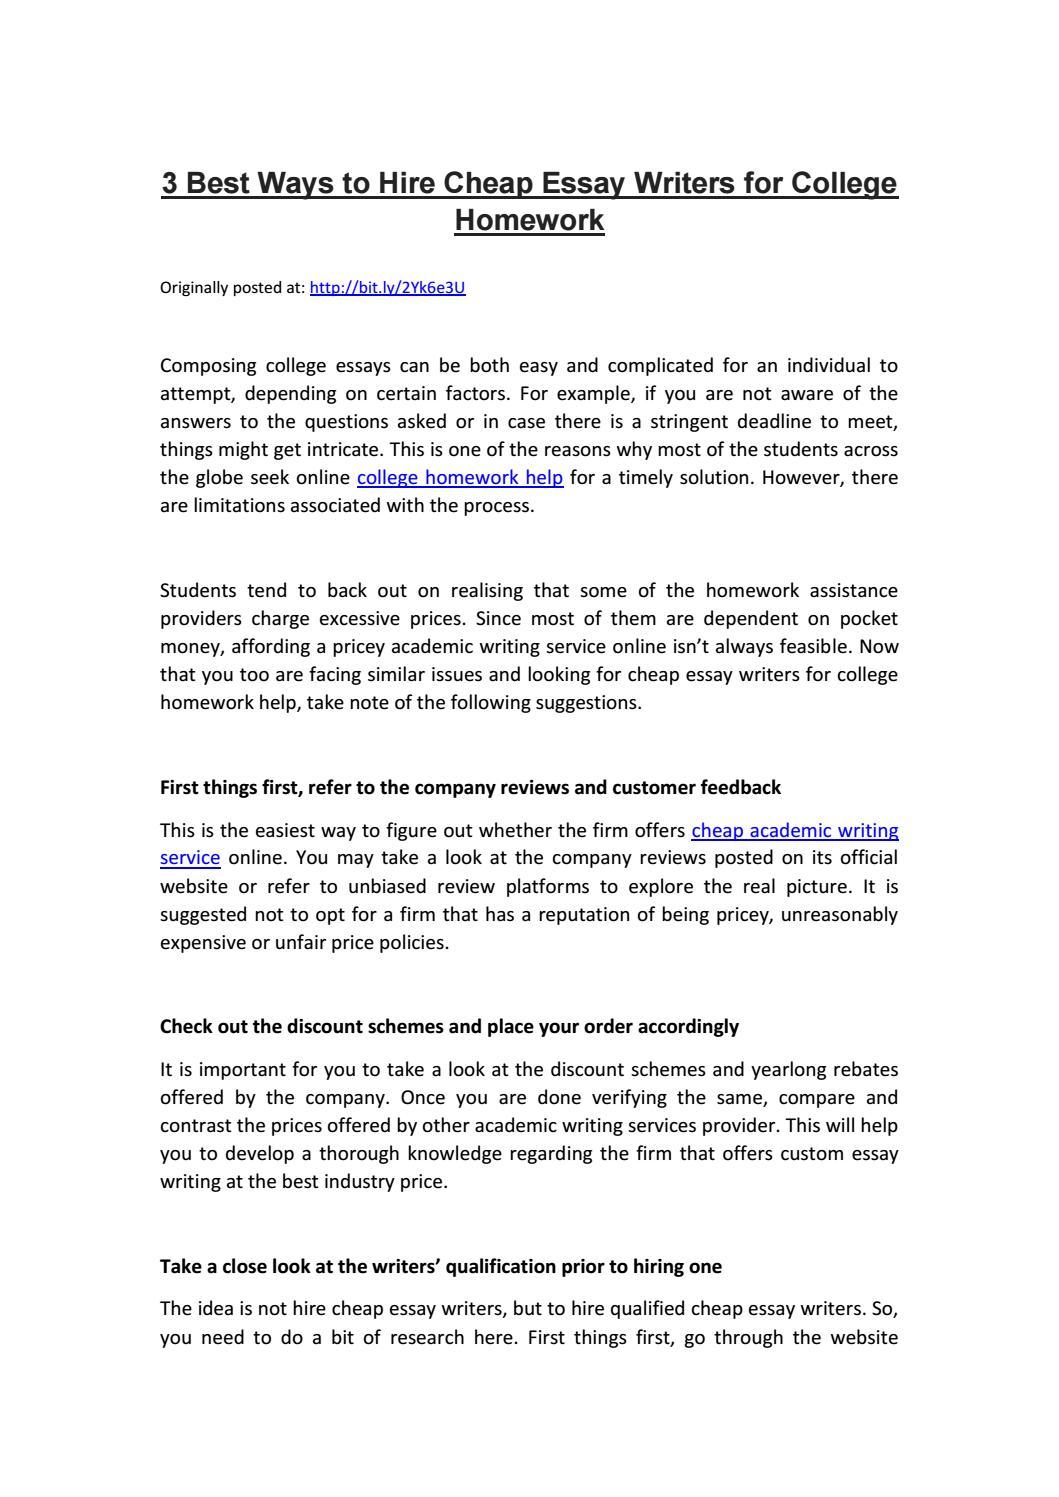 custom essay writing website for college